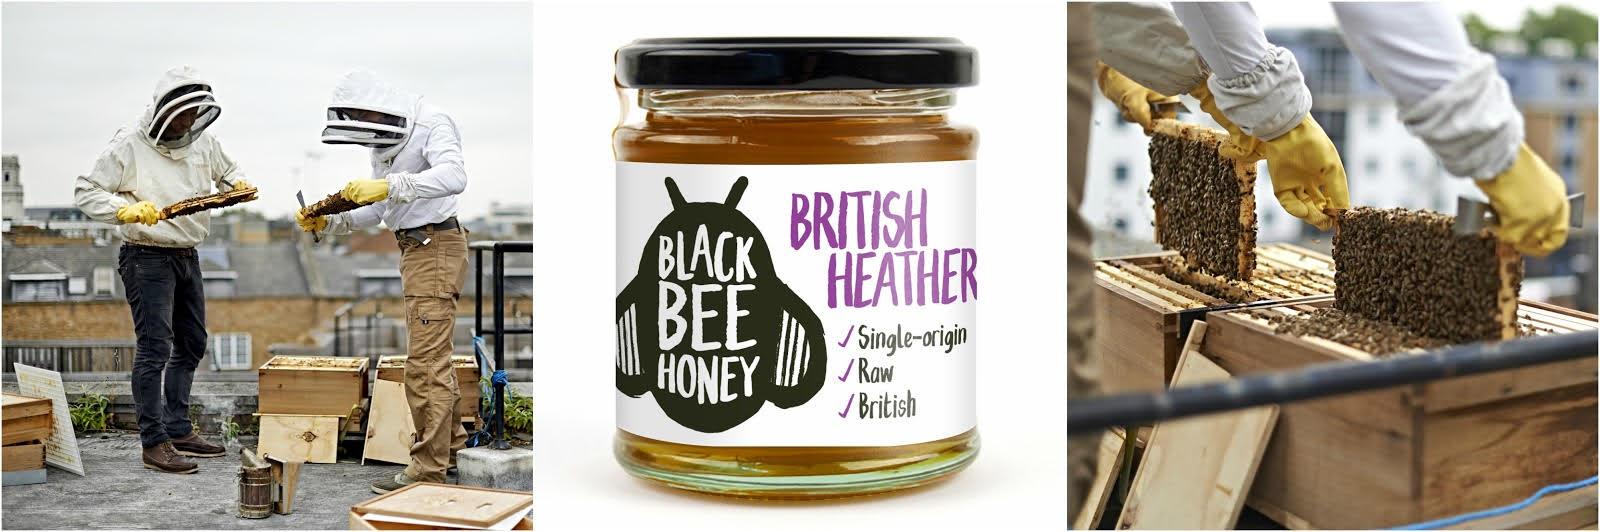 Black Bee Honey | London On The Inside